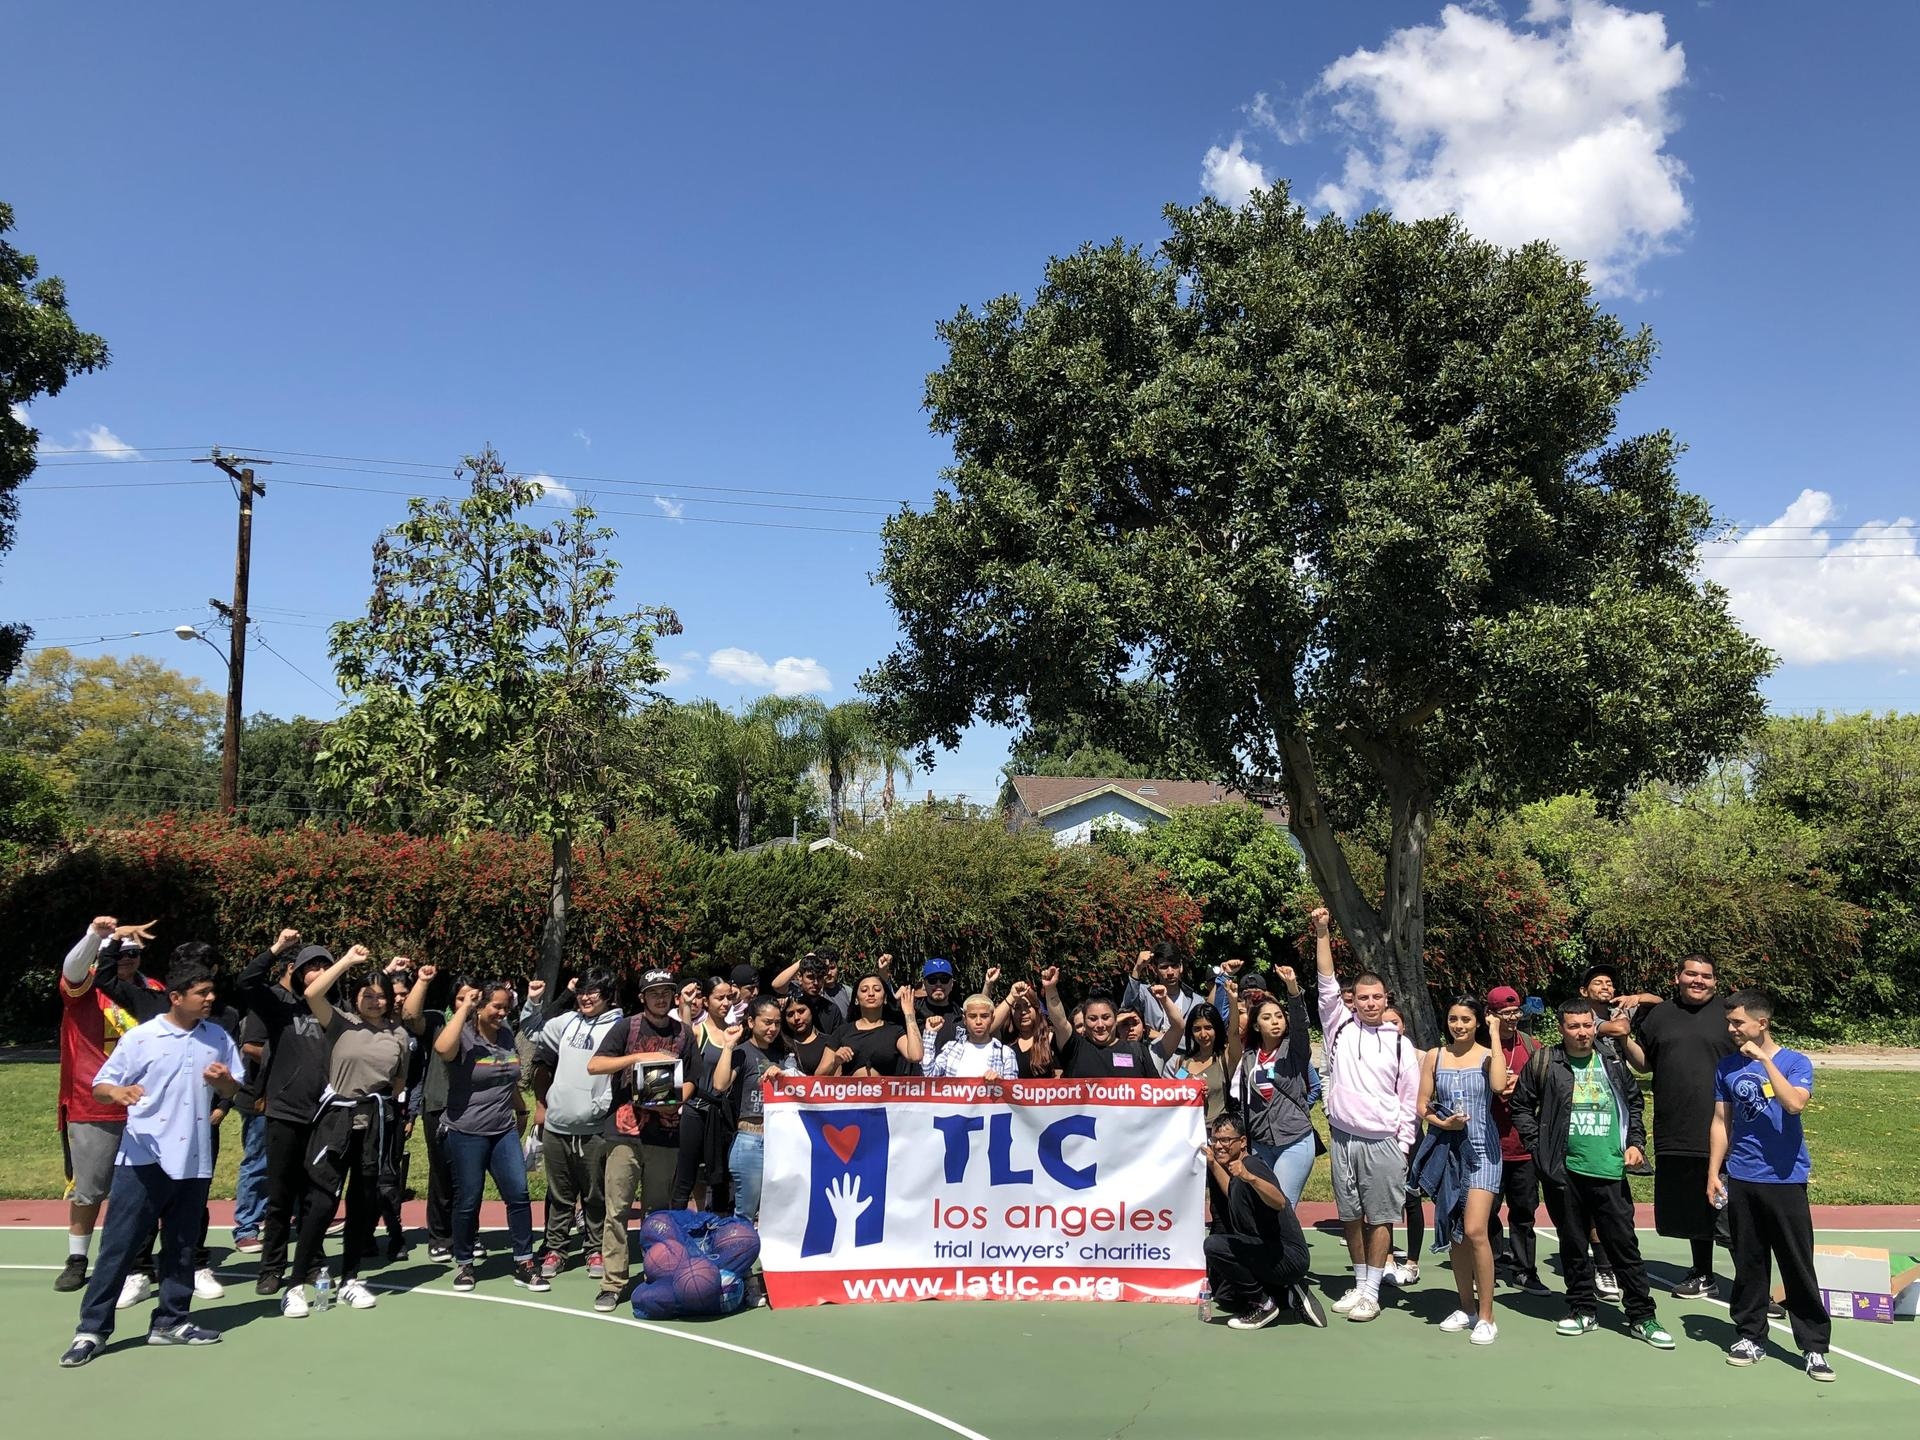 LA CAUSA student group shot